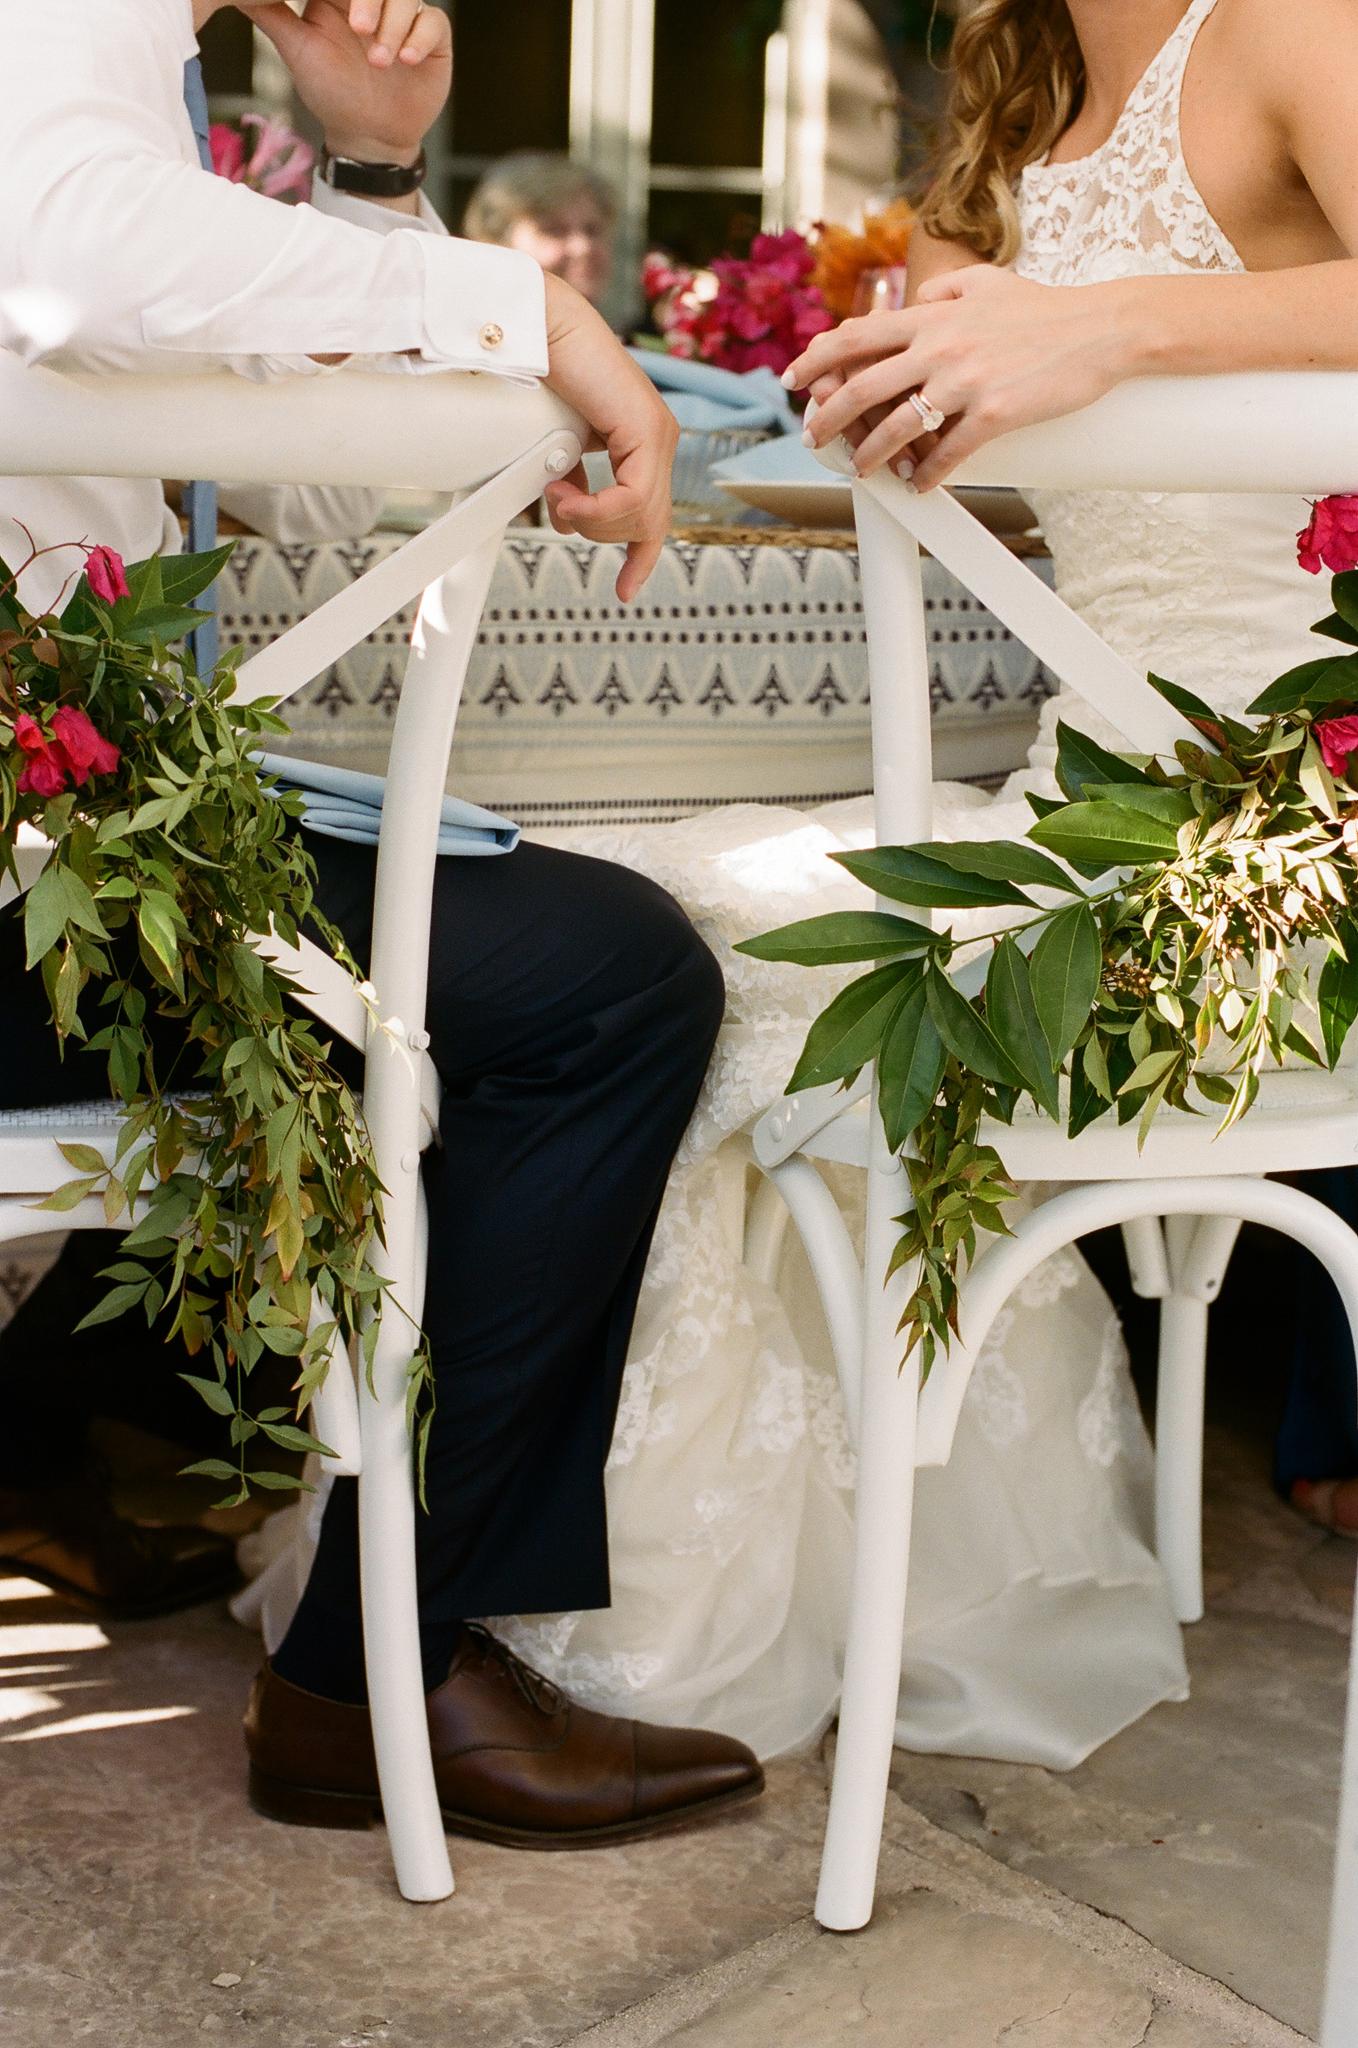 38-bride-groom-white-chair.jpg